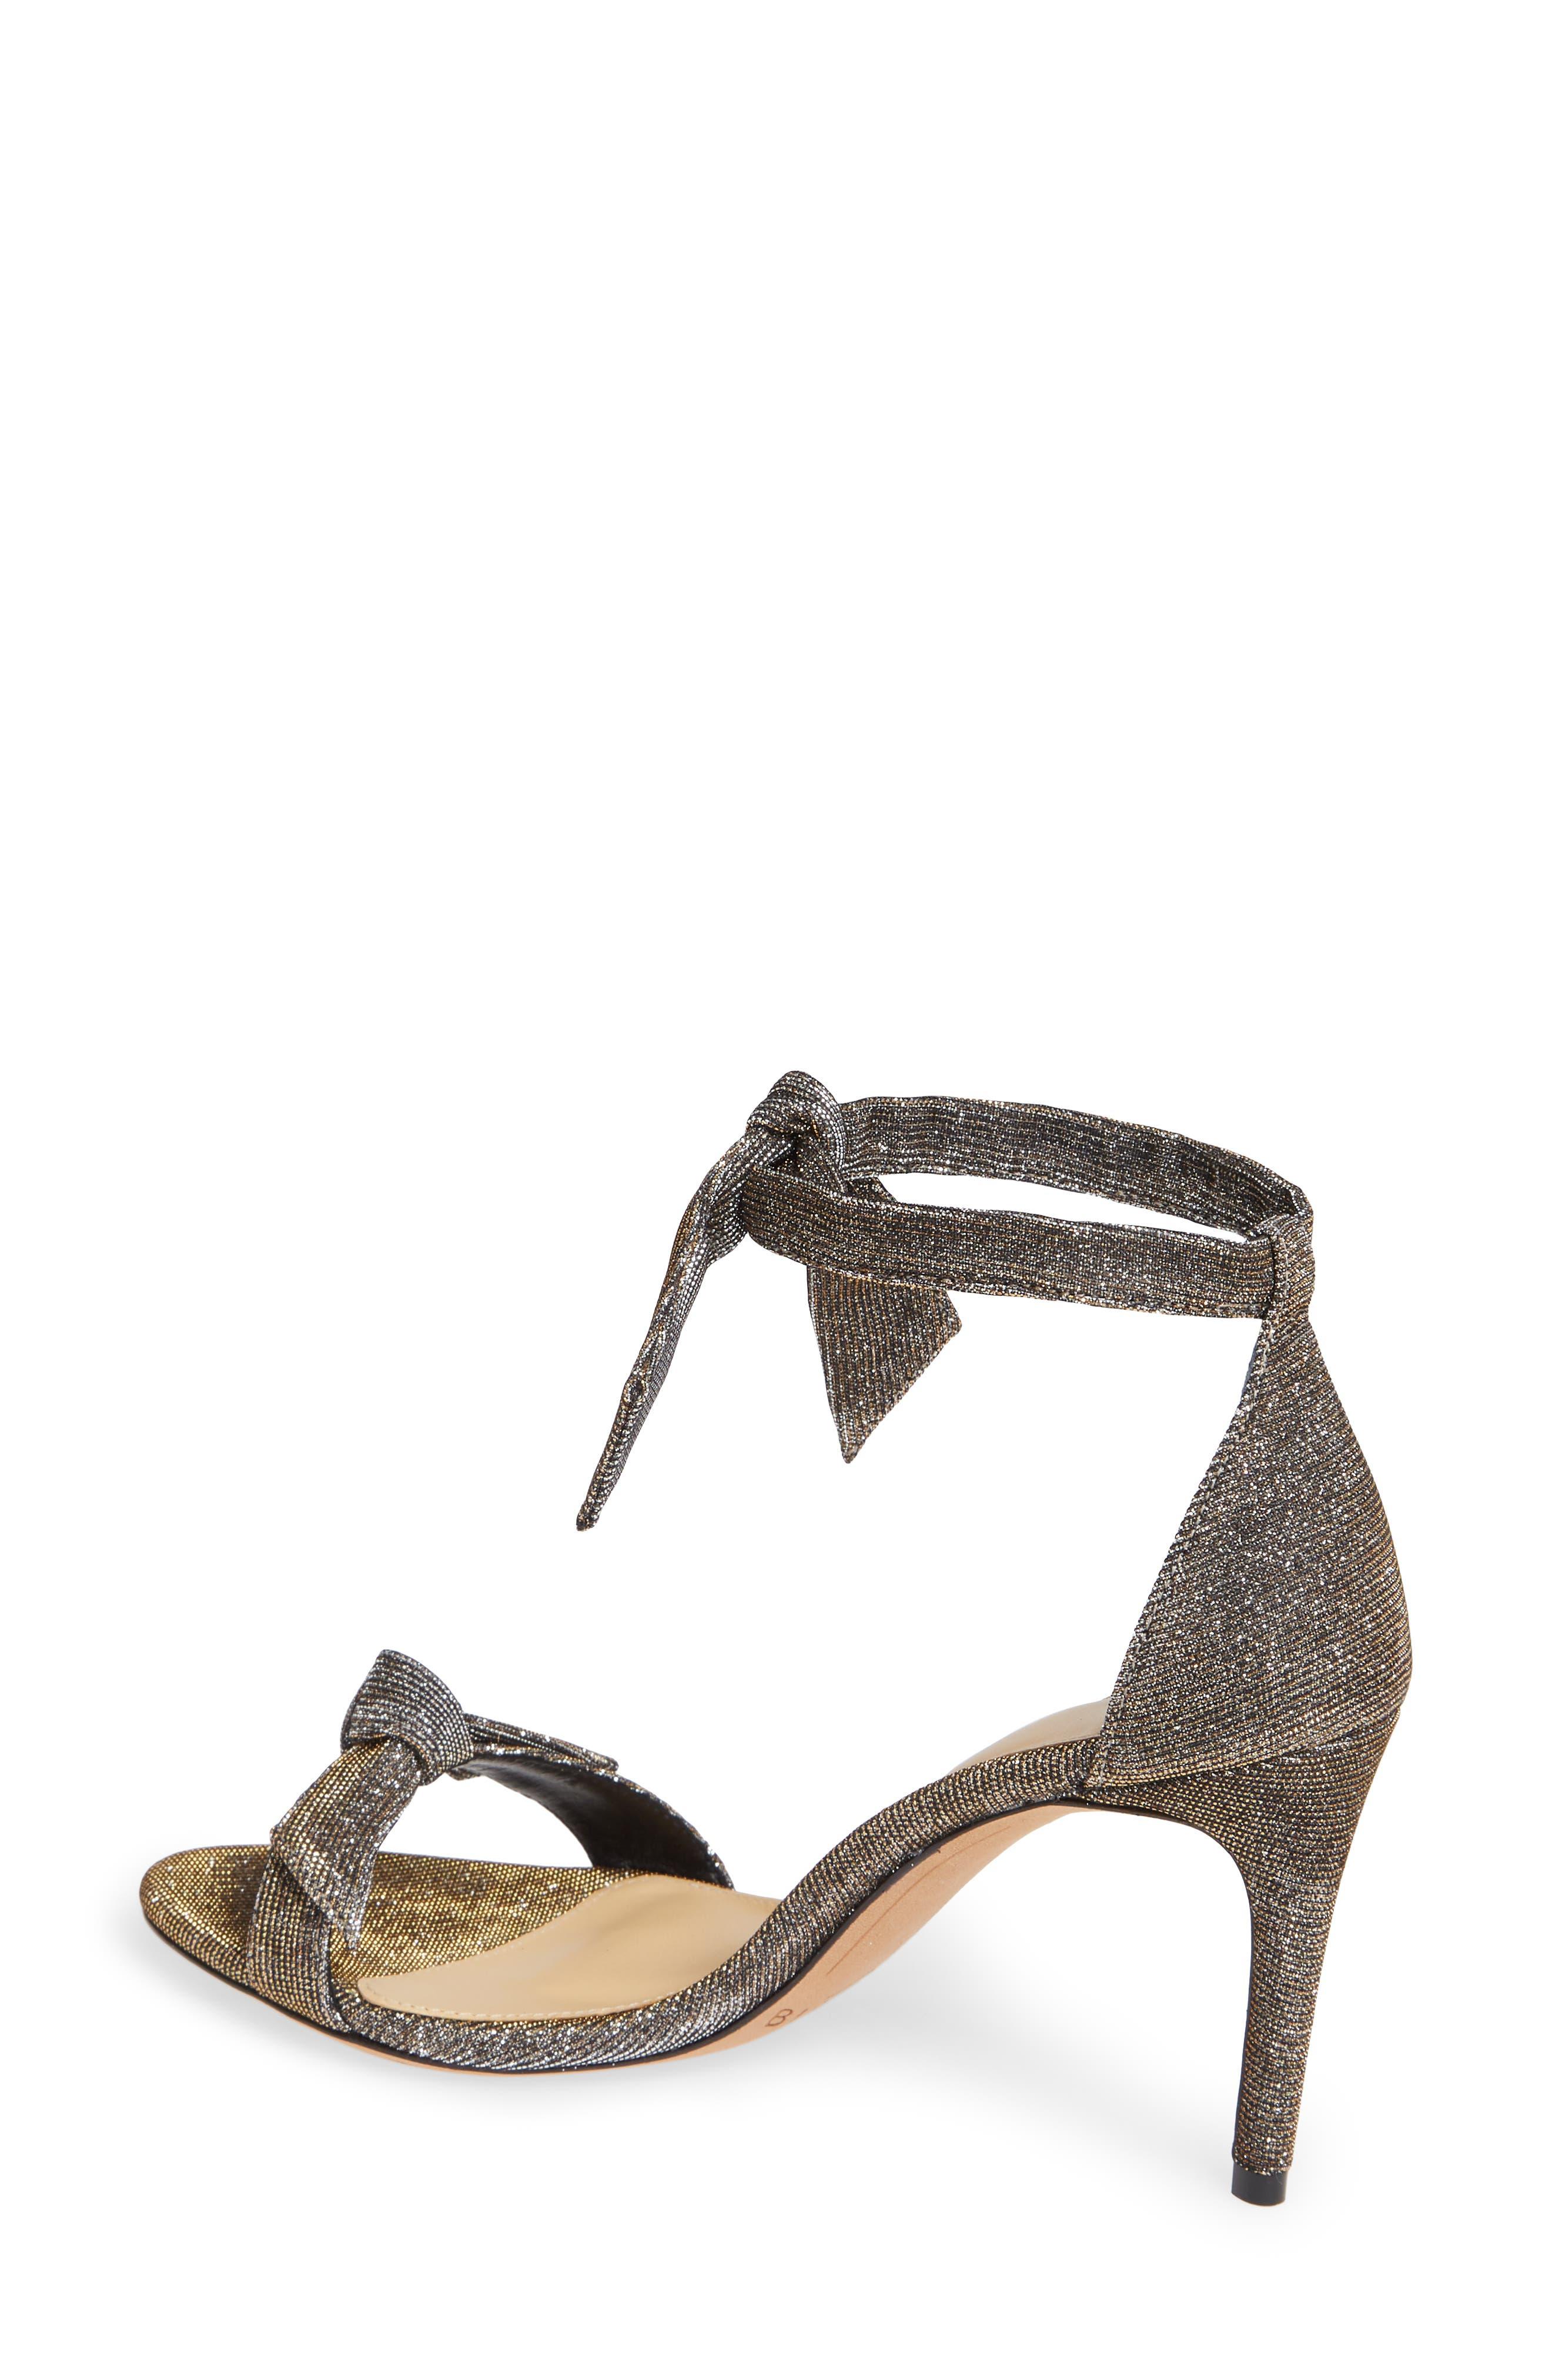 Clarita Ankle Strap Sandal,                             Alternate thumbnail 2, color,                             SILVER